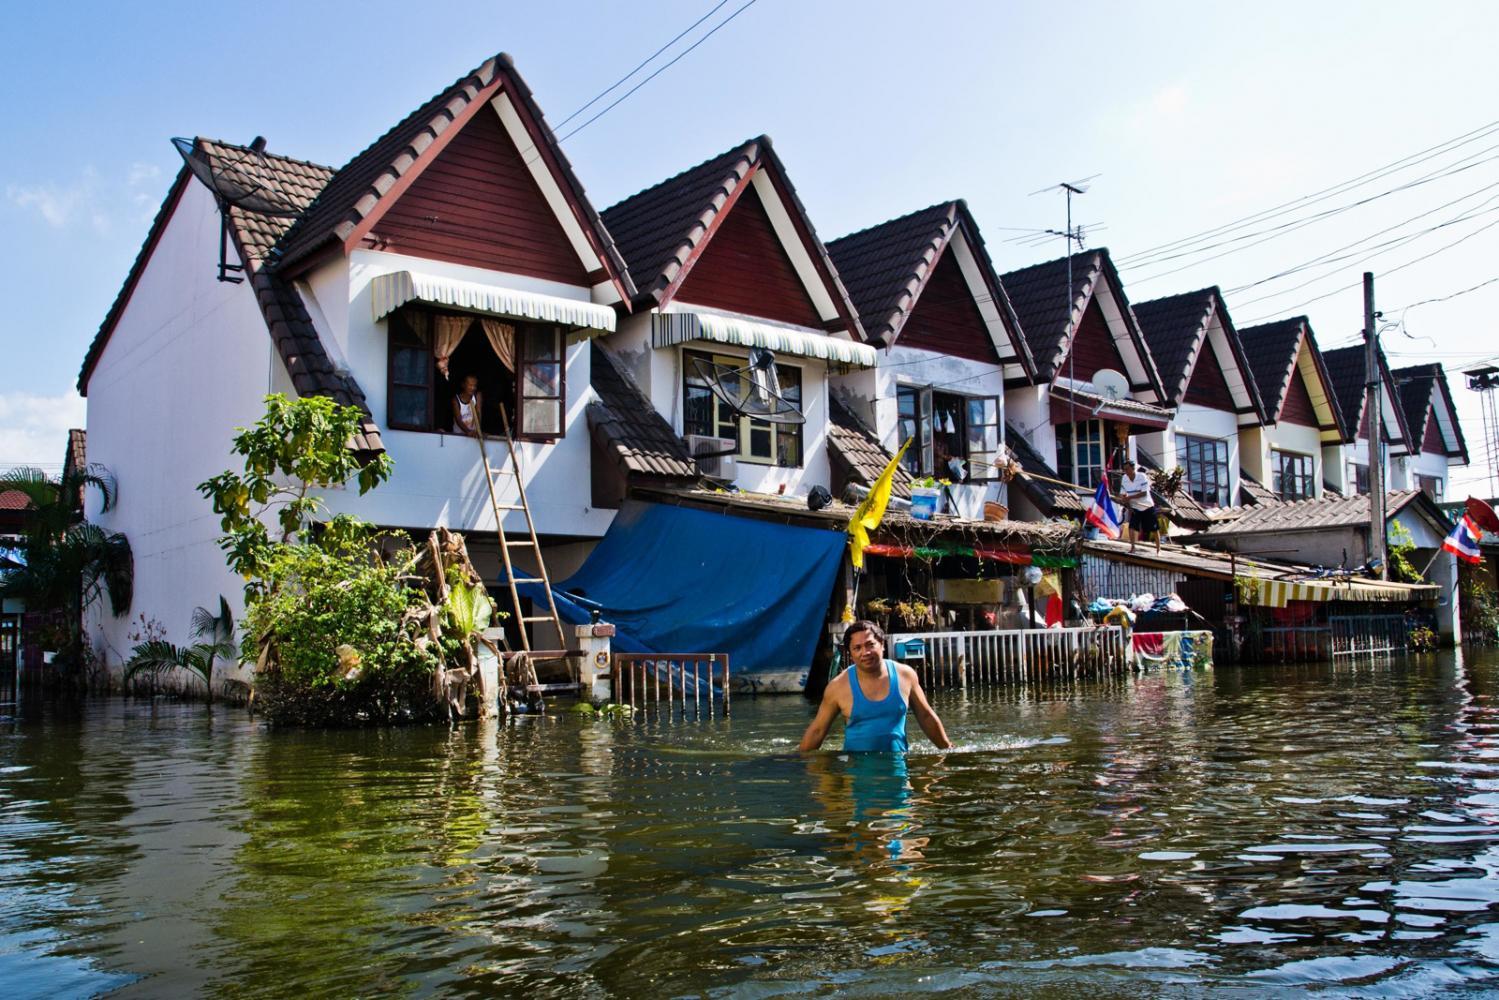 A man wades his Bangkok neighborhood during the 2011 floods.